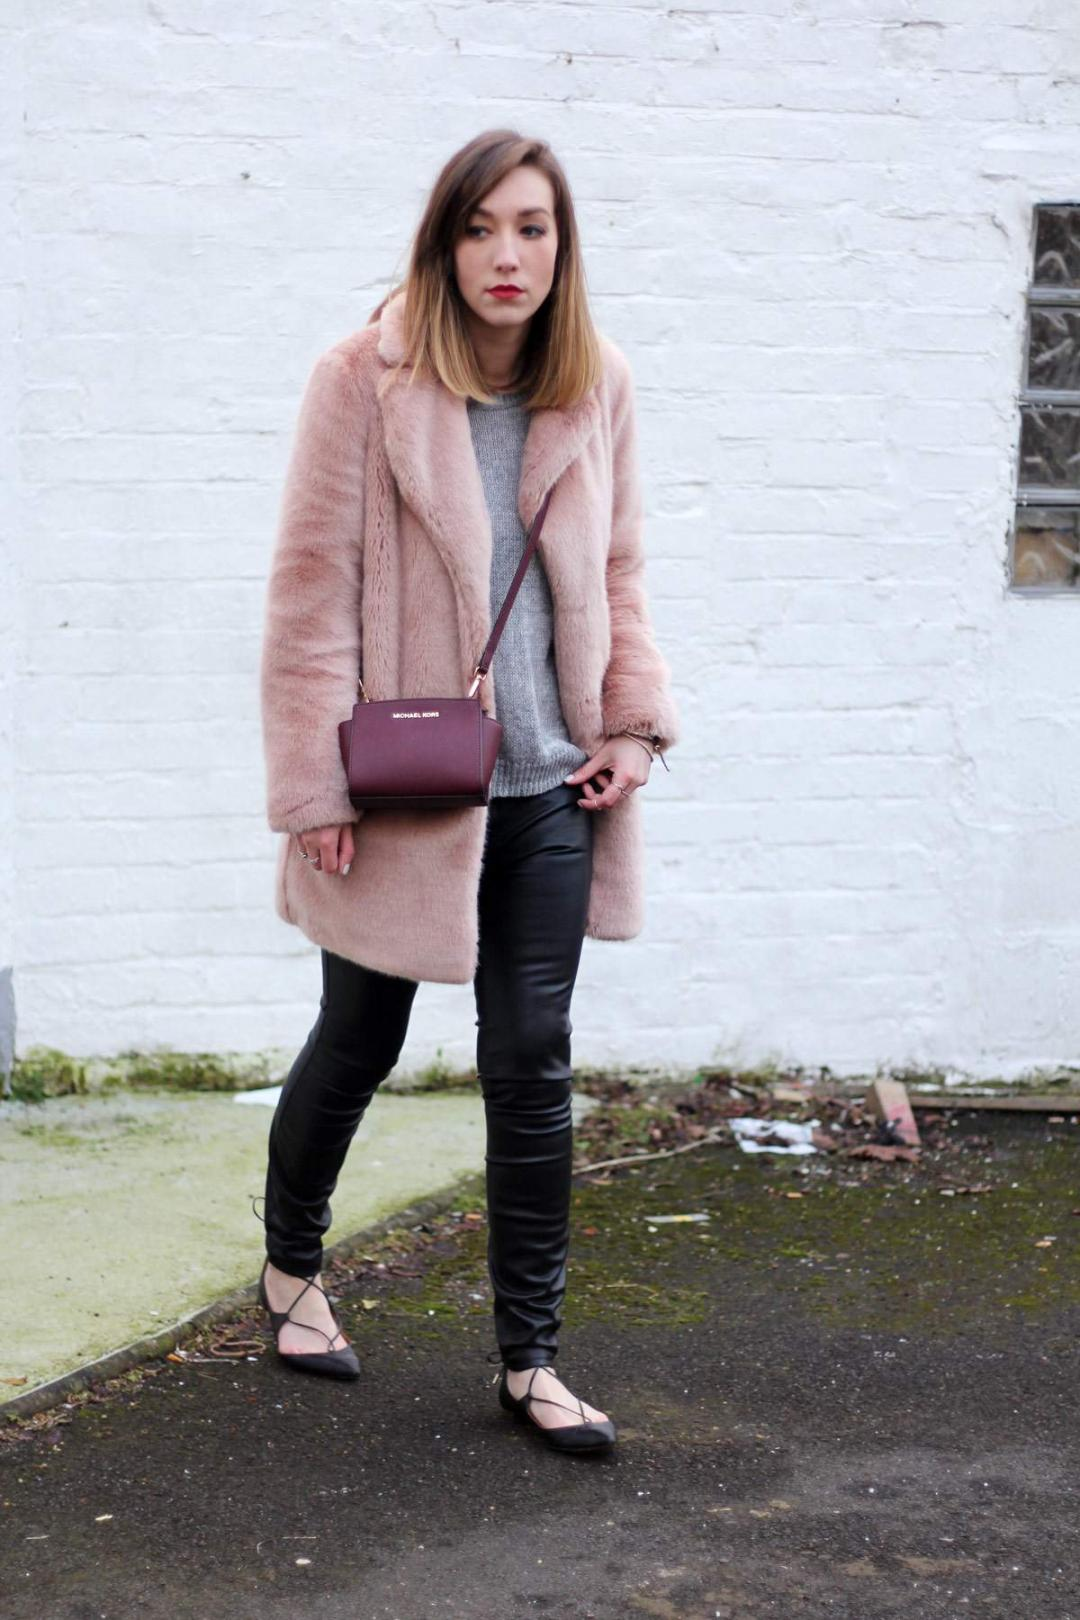 reiss-alba-pink-fur-coat-leather-skinny-jeans-michael-kors-burgundy-selma-bag-aquazzura-christy-flat-shoes